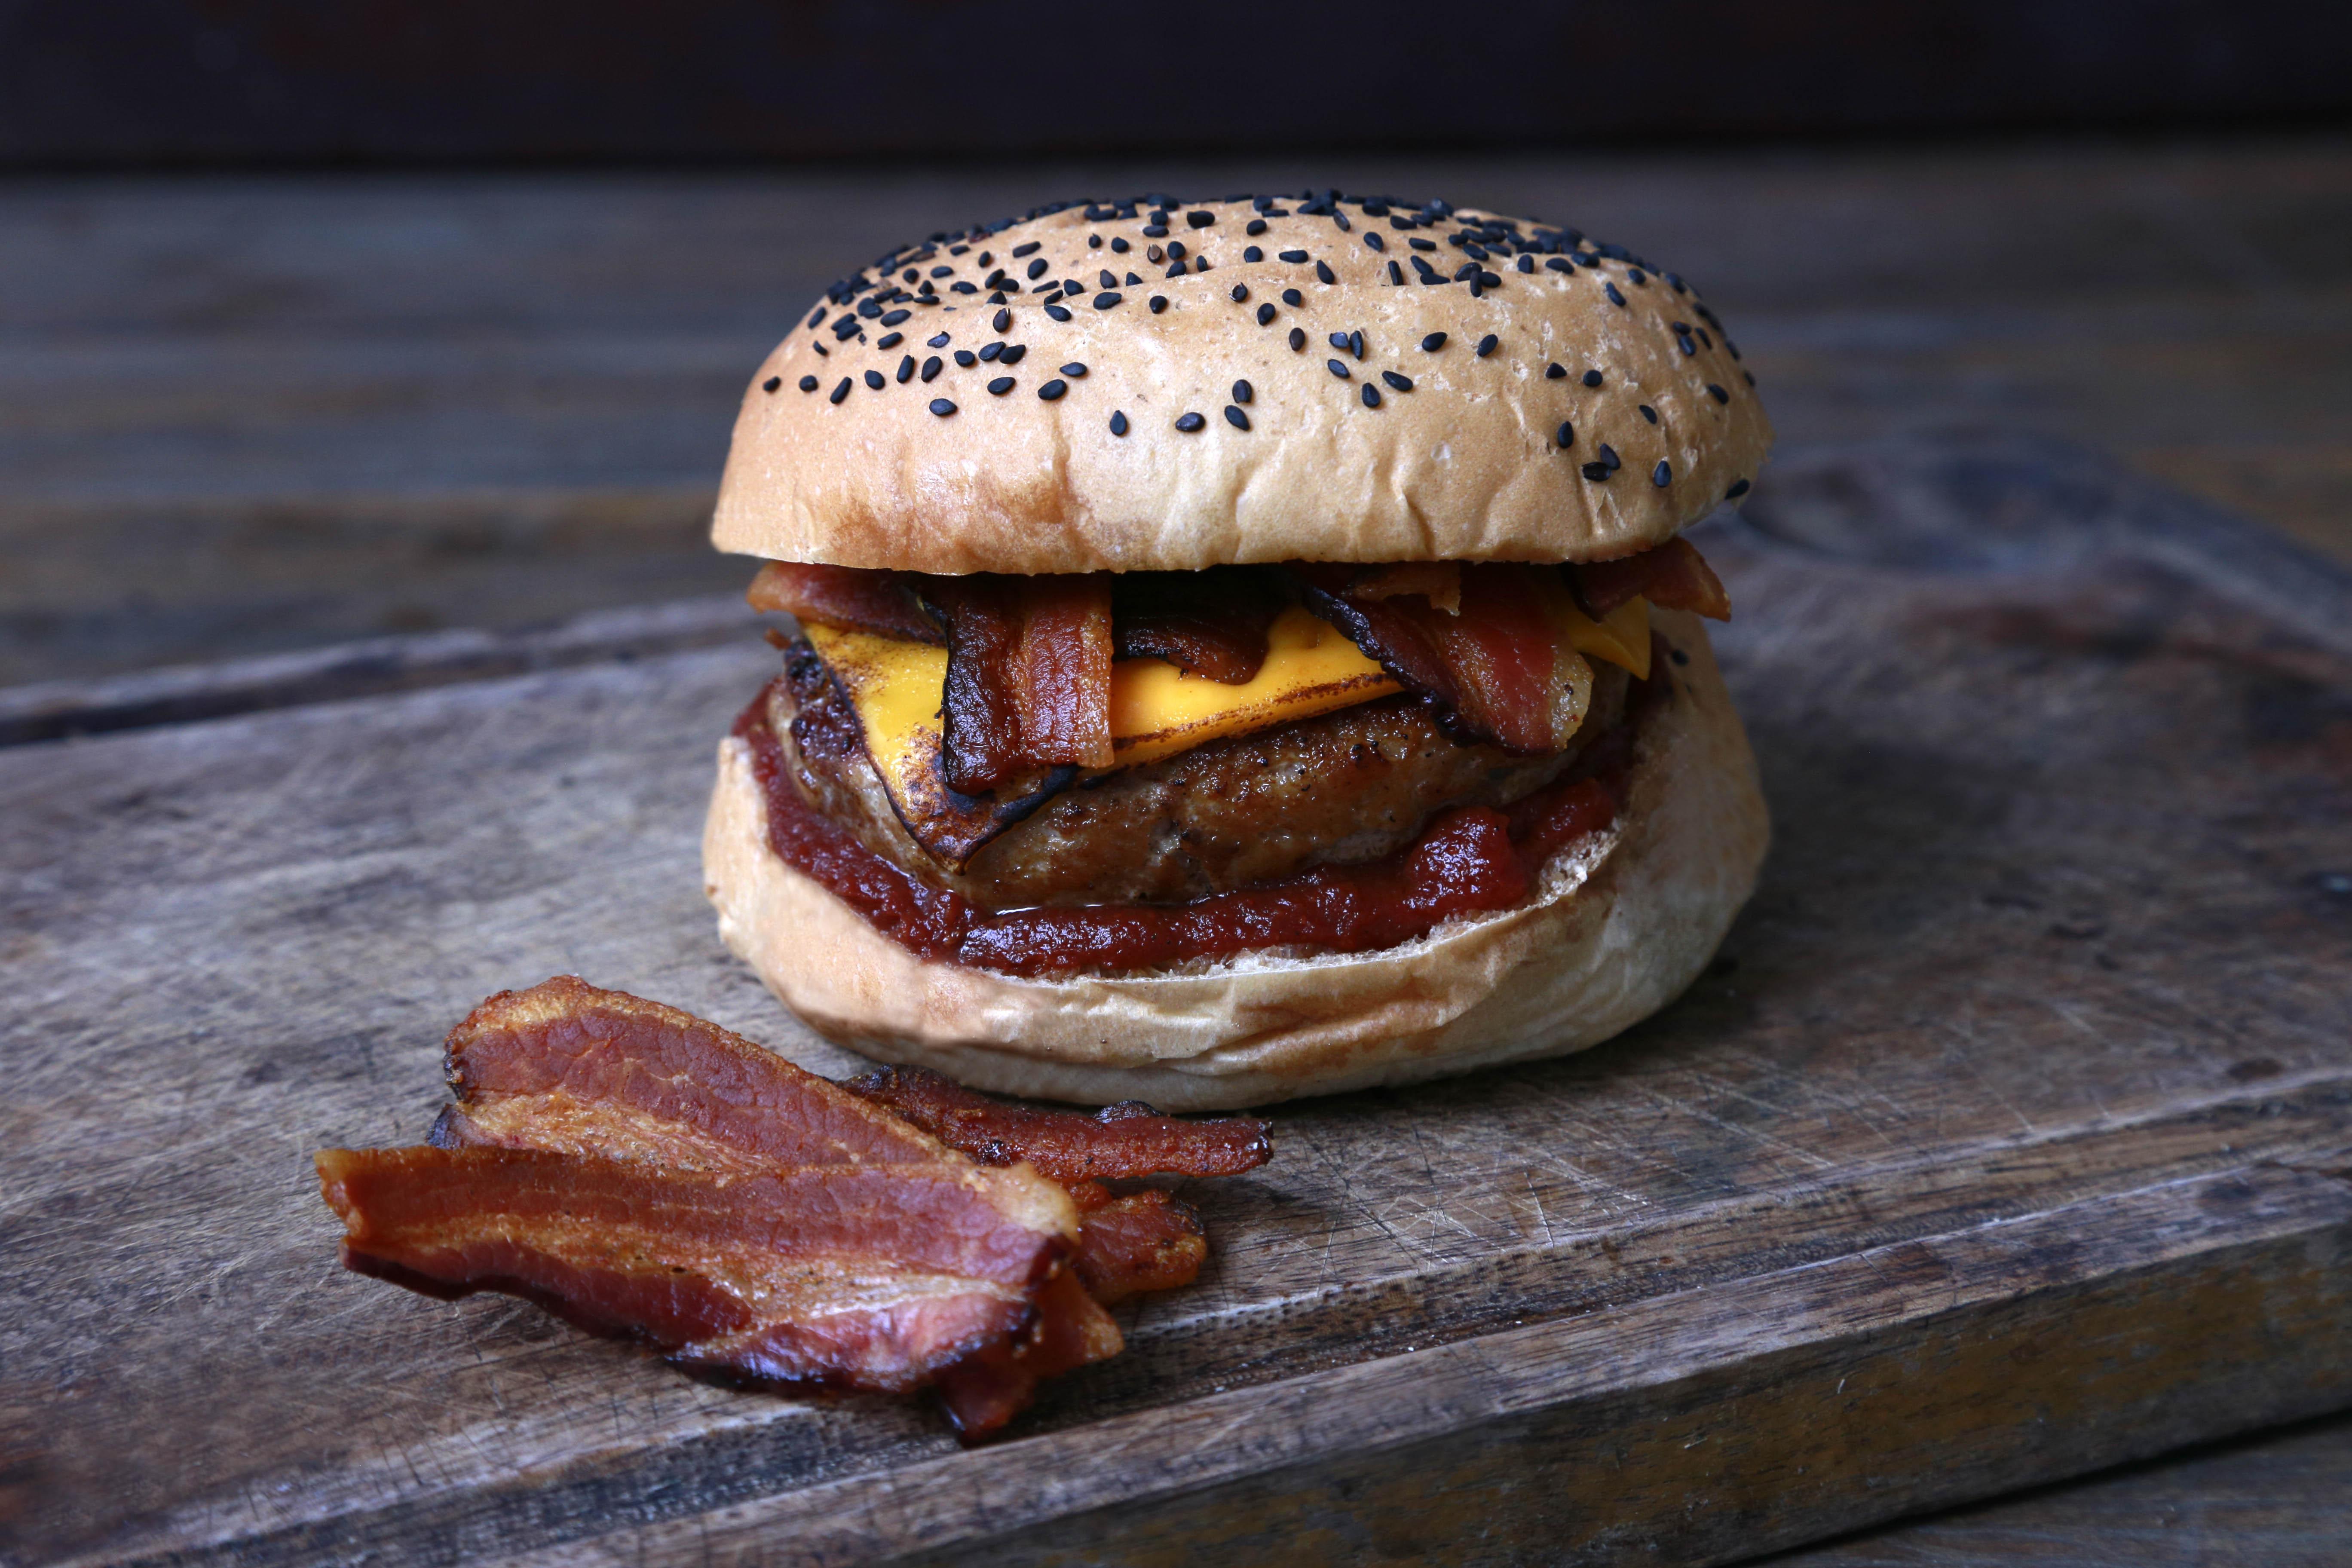 Oinc Poitc - Degusta Burger